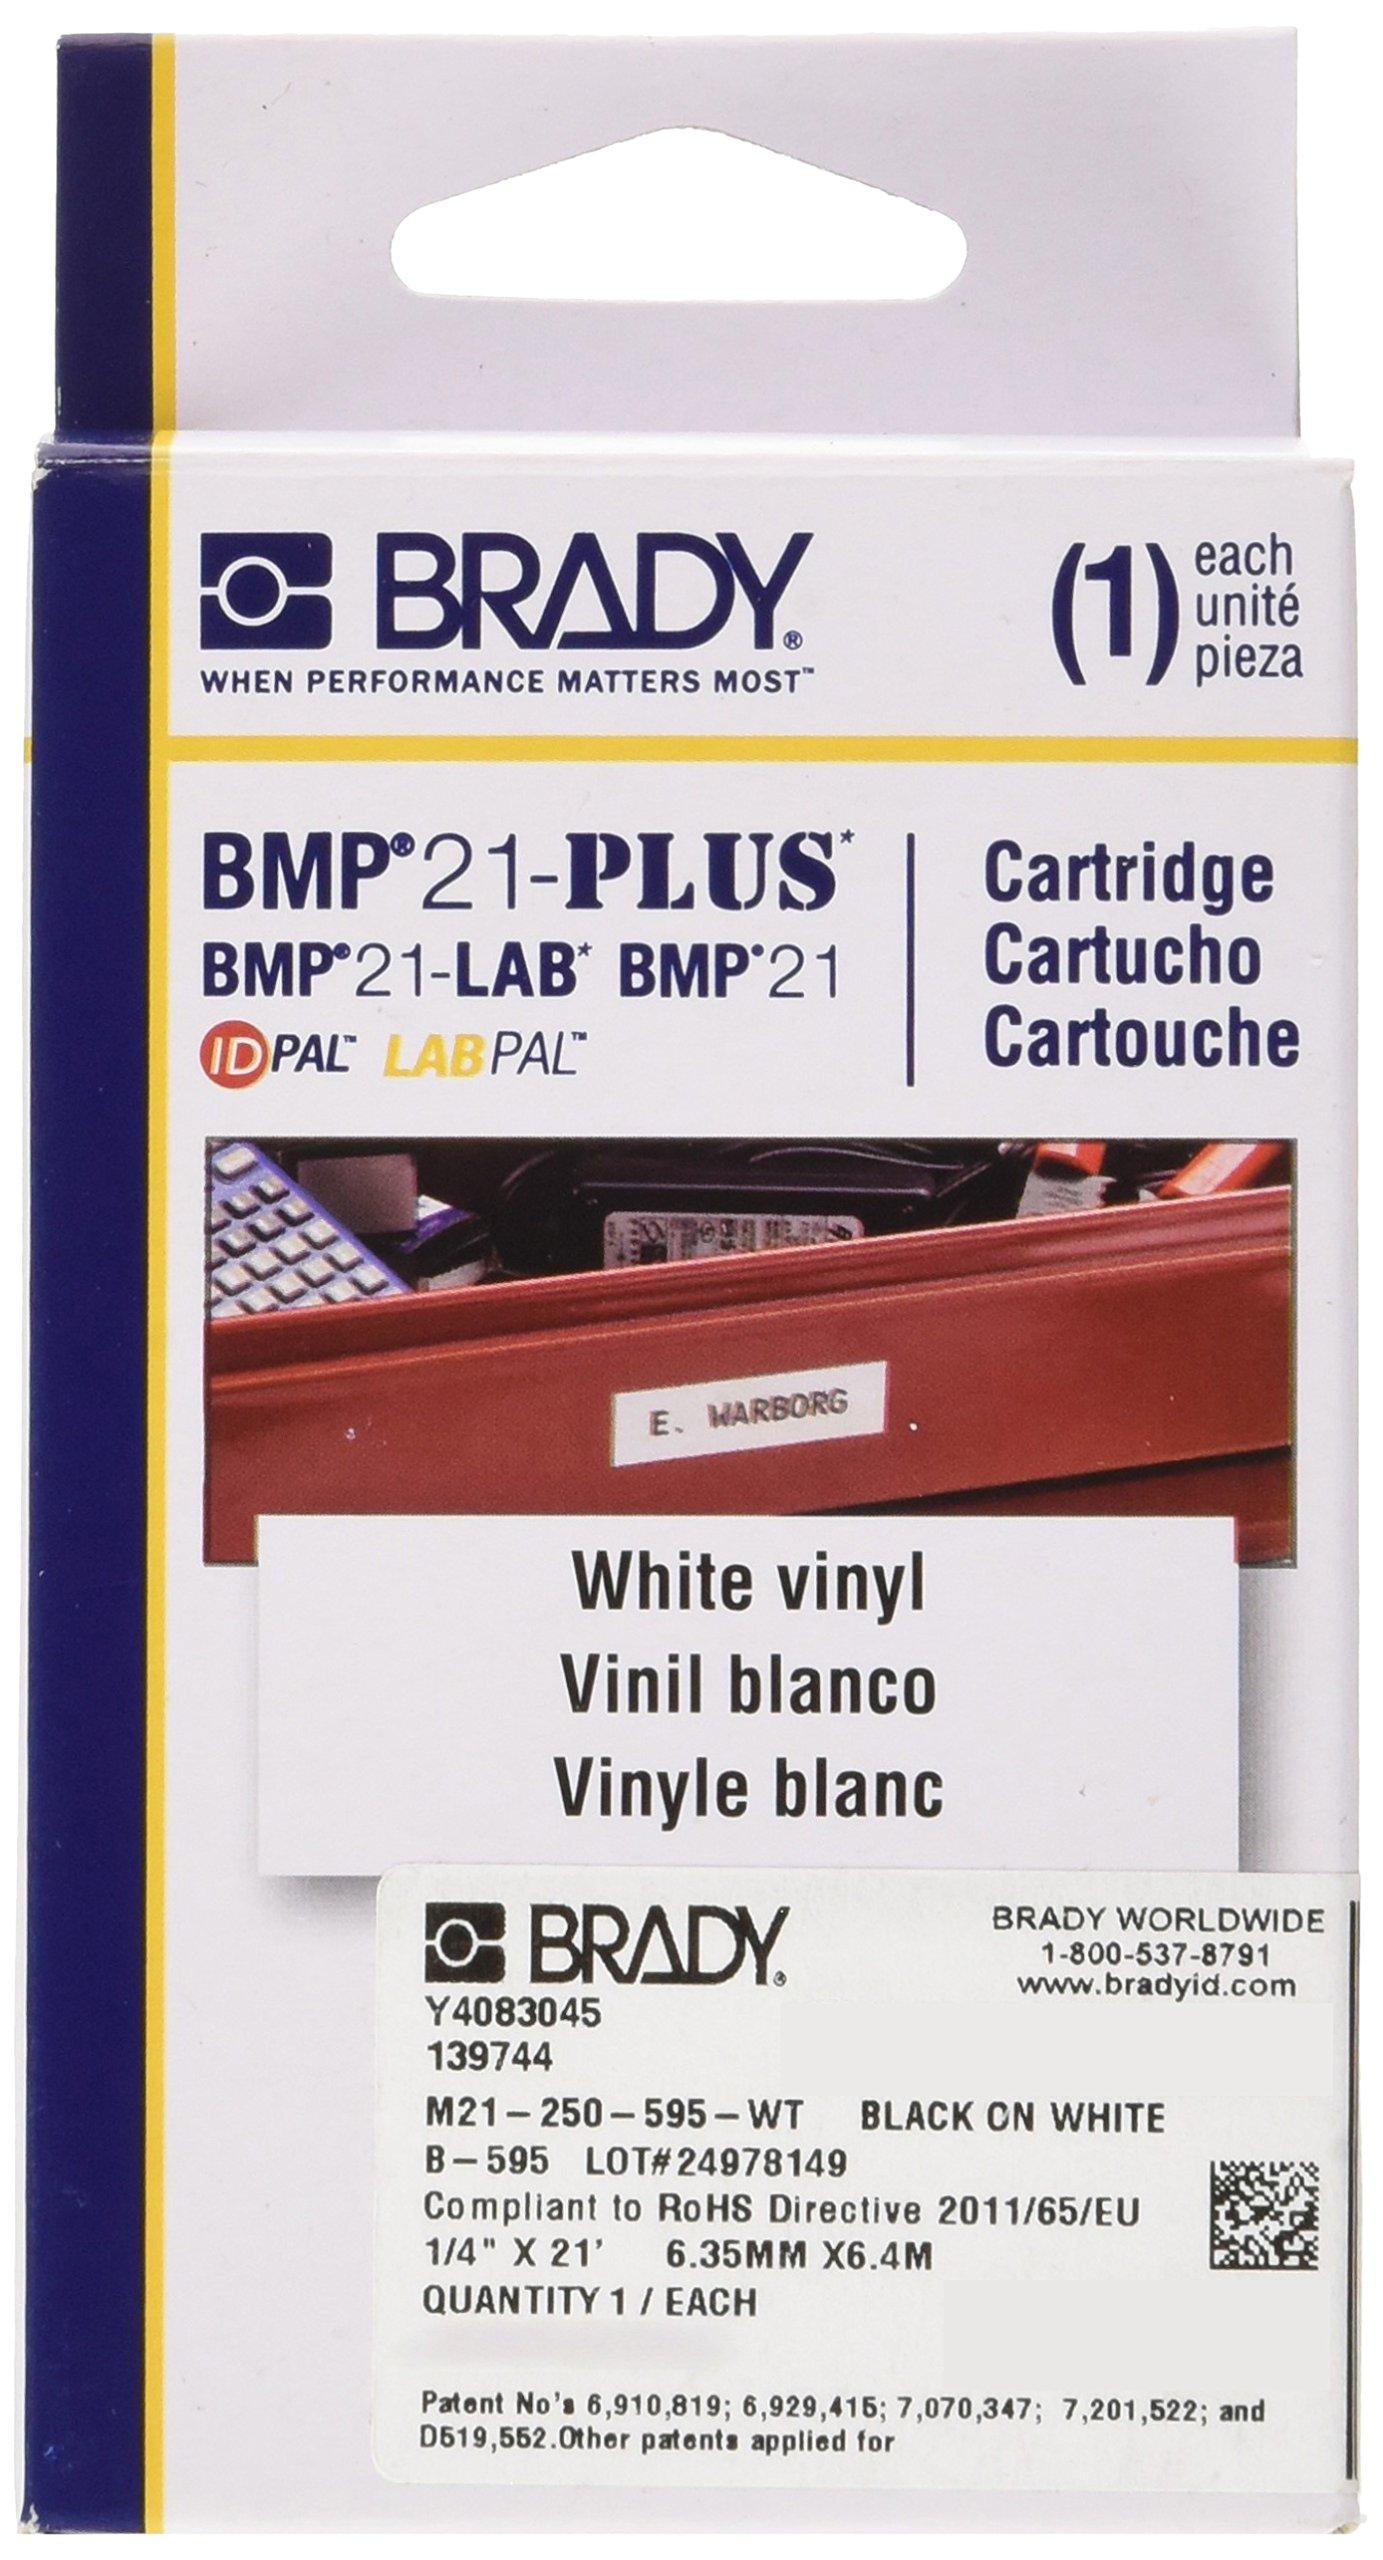 Brady M21-250-595-WT Cartridge, B595 Vinyl Indoor/Outdoor Material, 0.25'' W x 21' L, Black on White